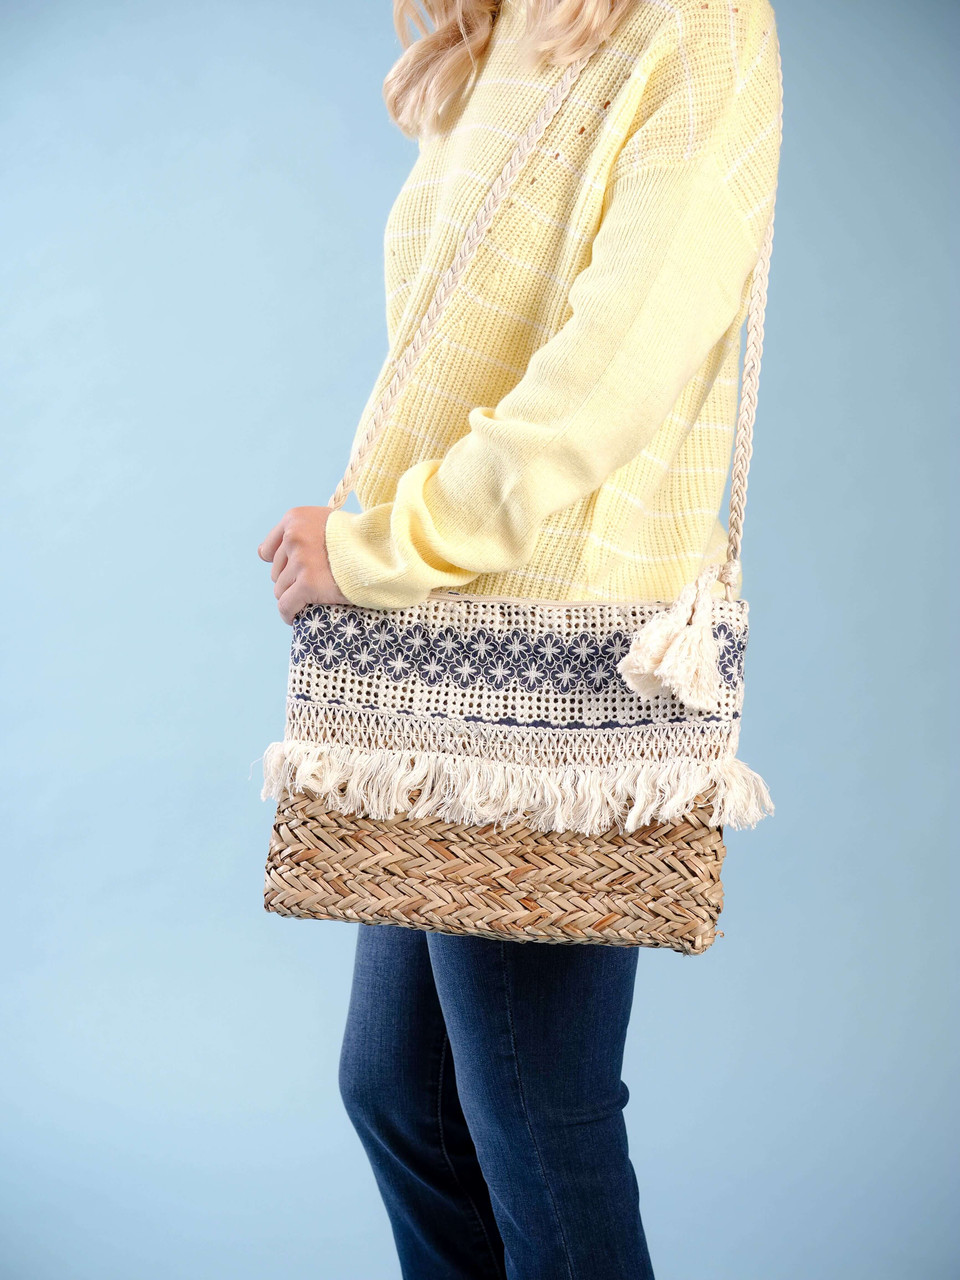 straw crossbody crochet detail ivory and blue